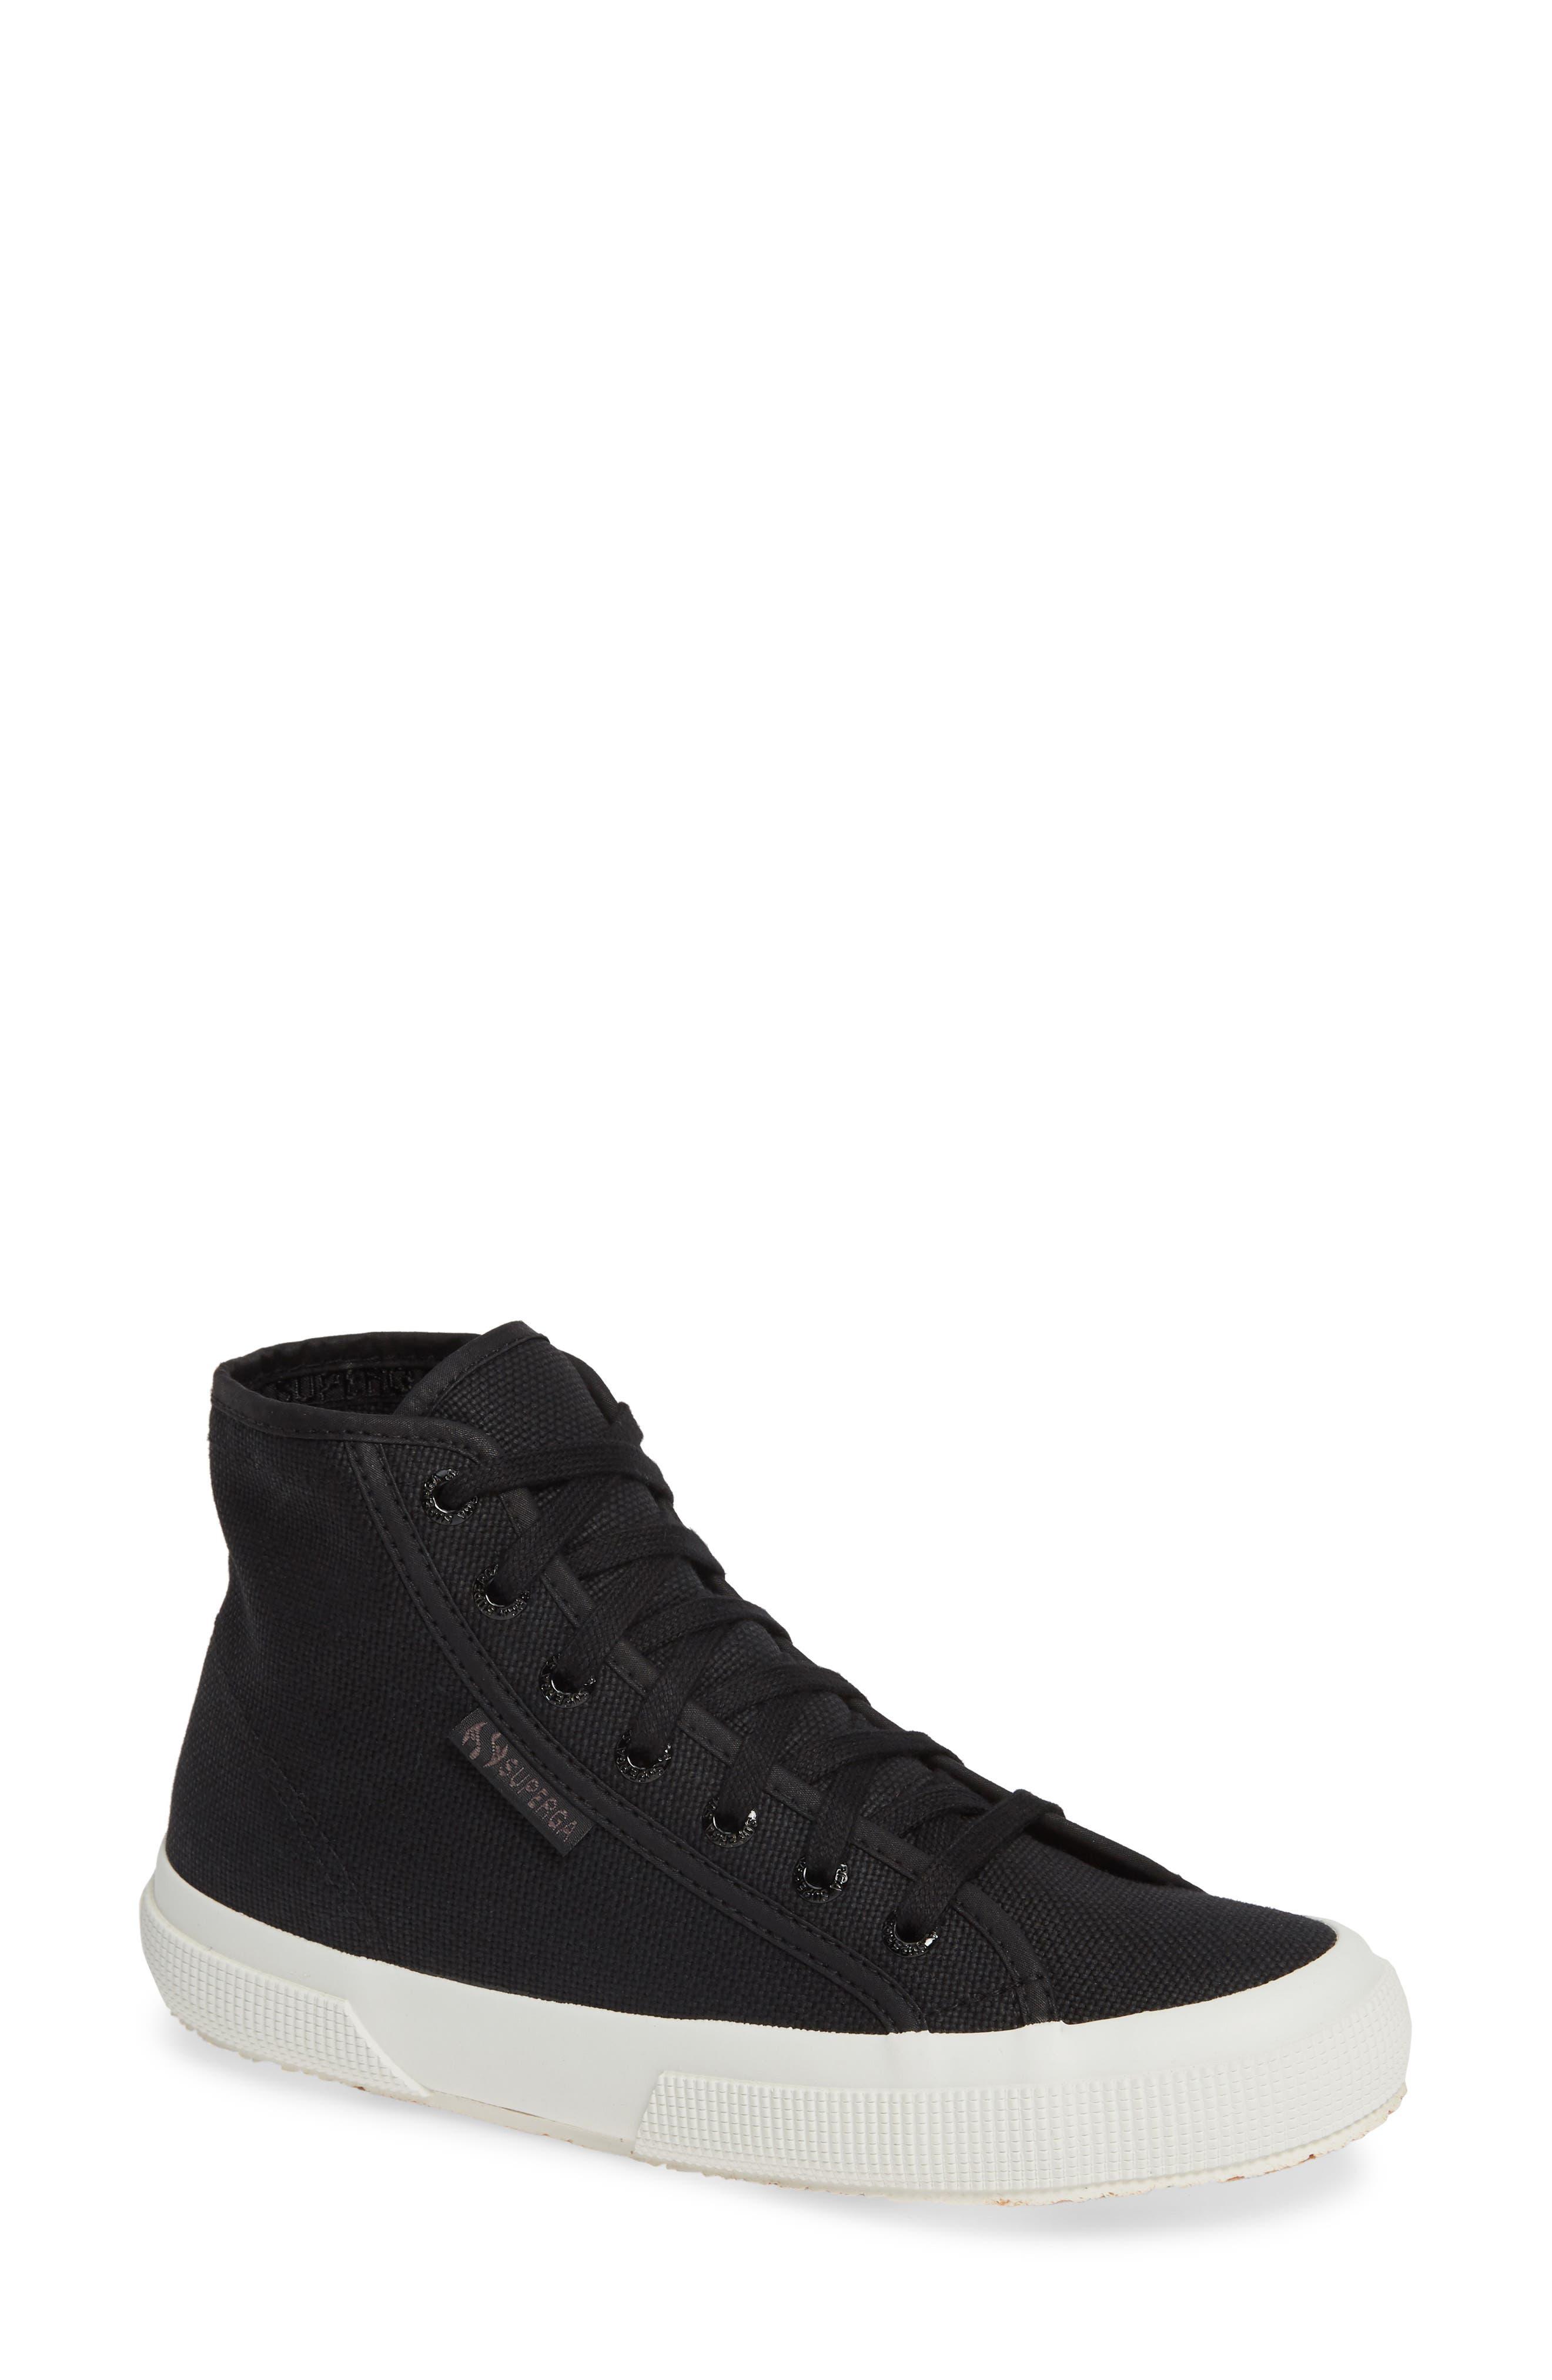 2795 High Top Sneaker,                         Main,                         color, BLACK/ WHITE